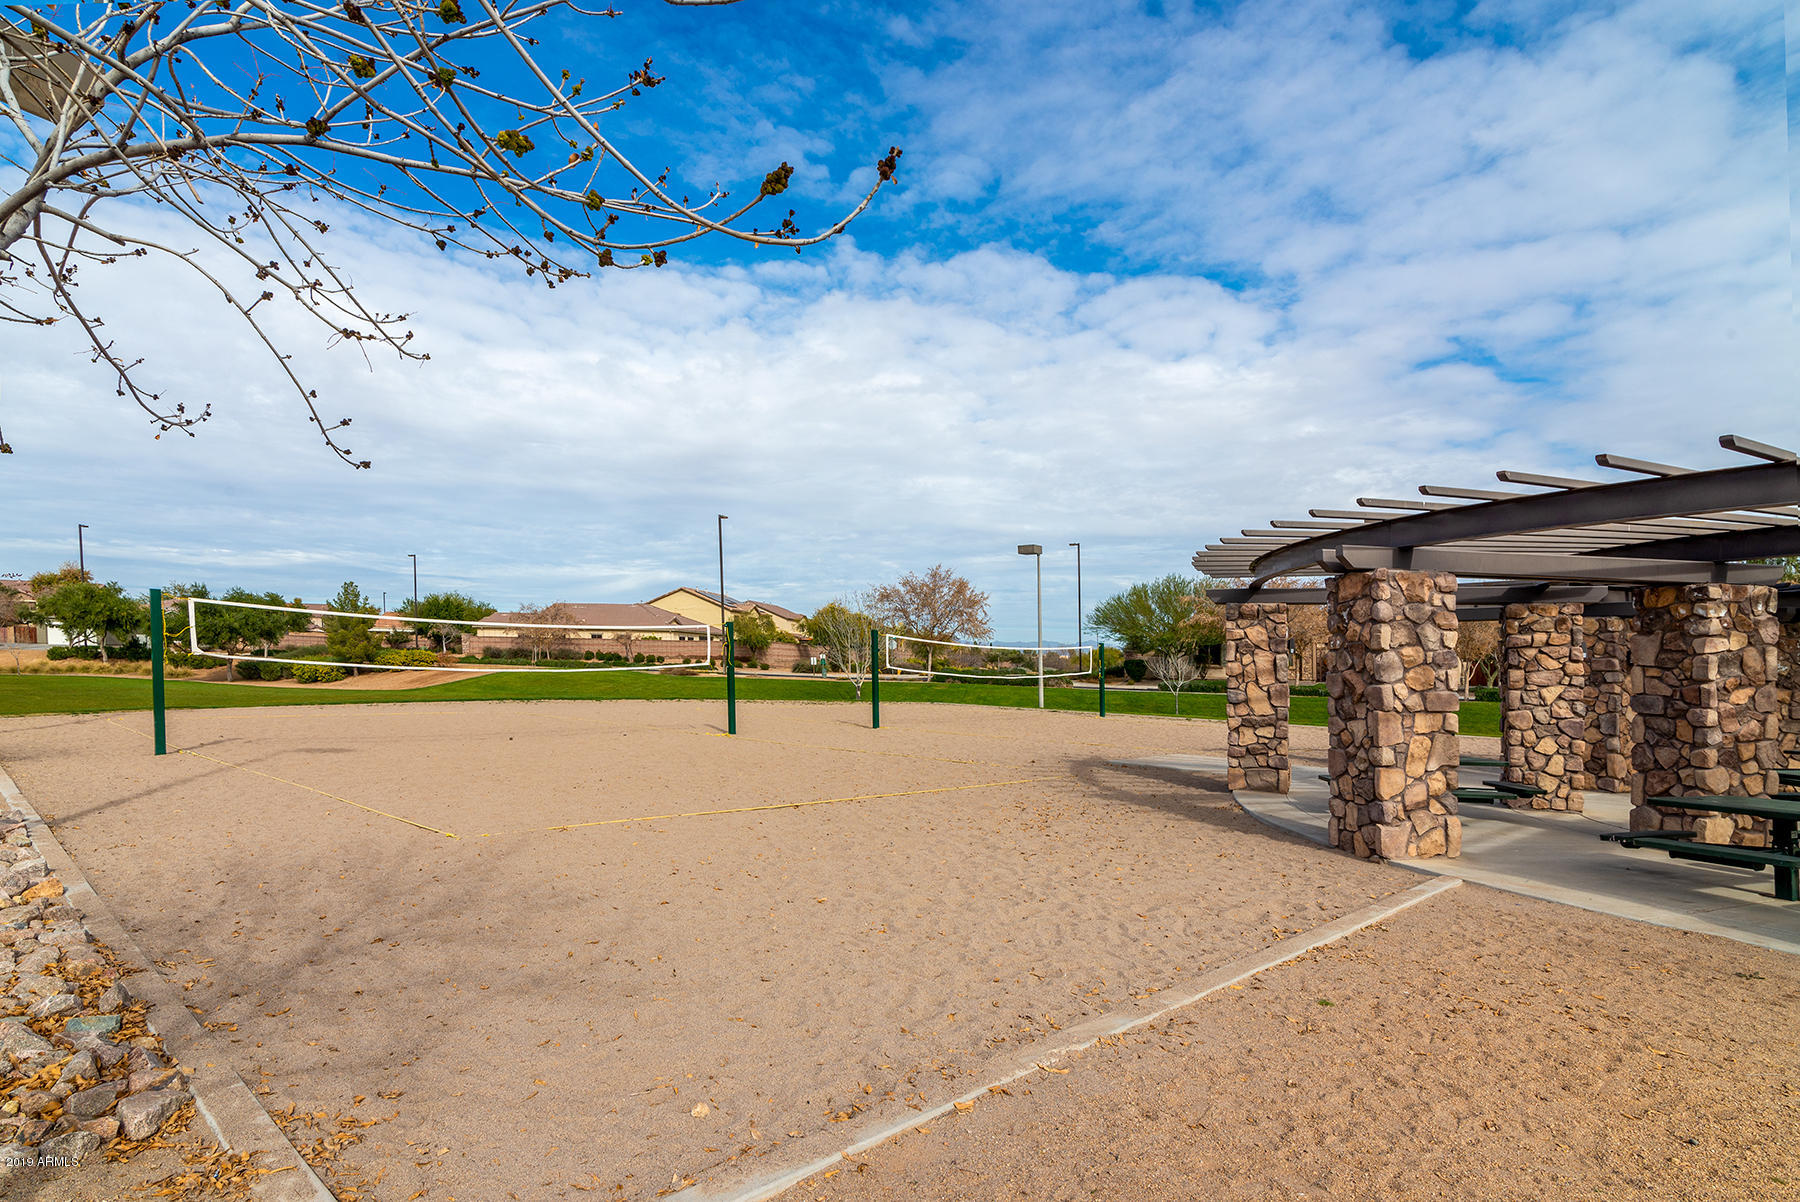 MLS 5880058 2751 E CRESCENT Way, Gilbert, AZ 85298 Shamrock Estates